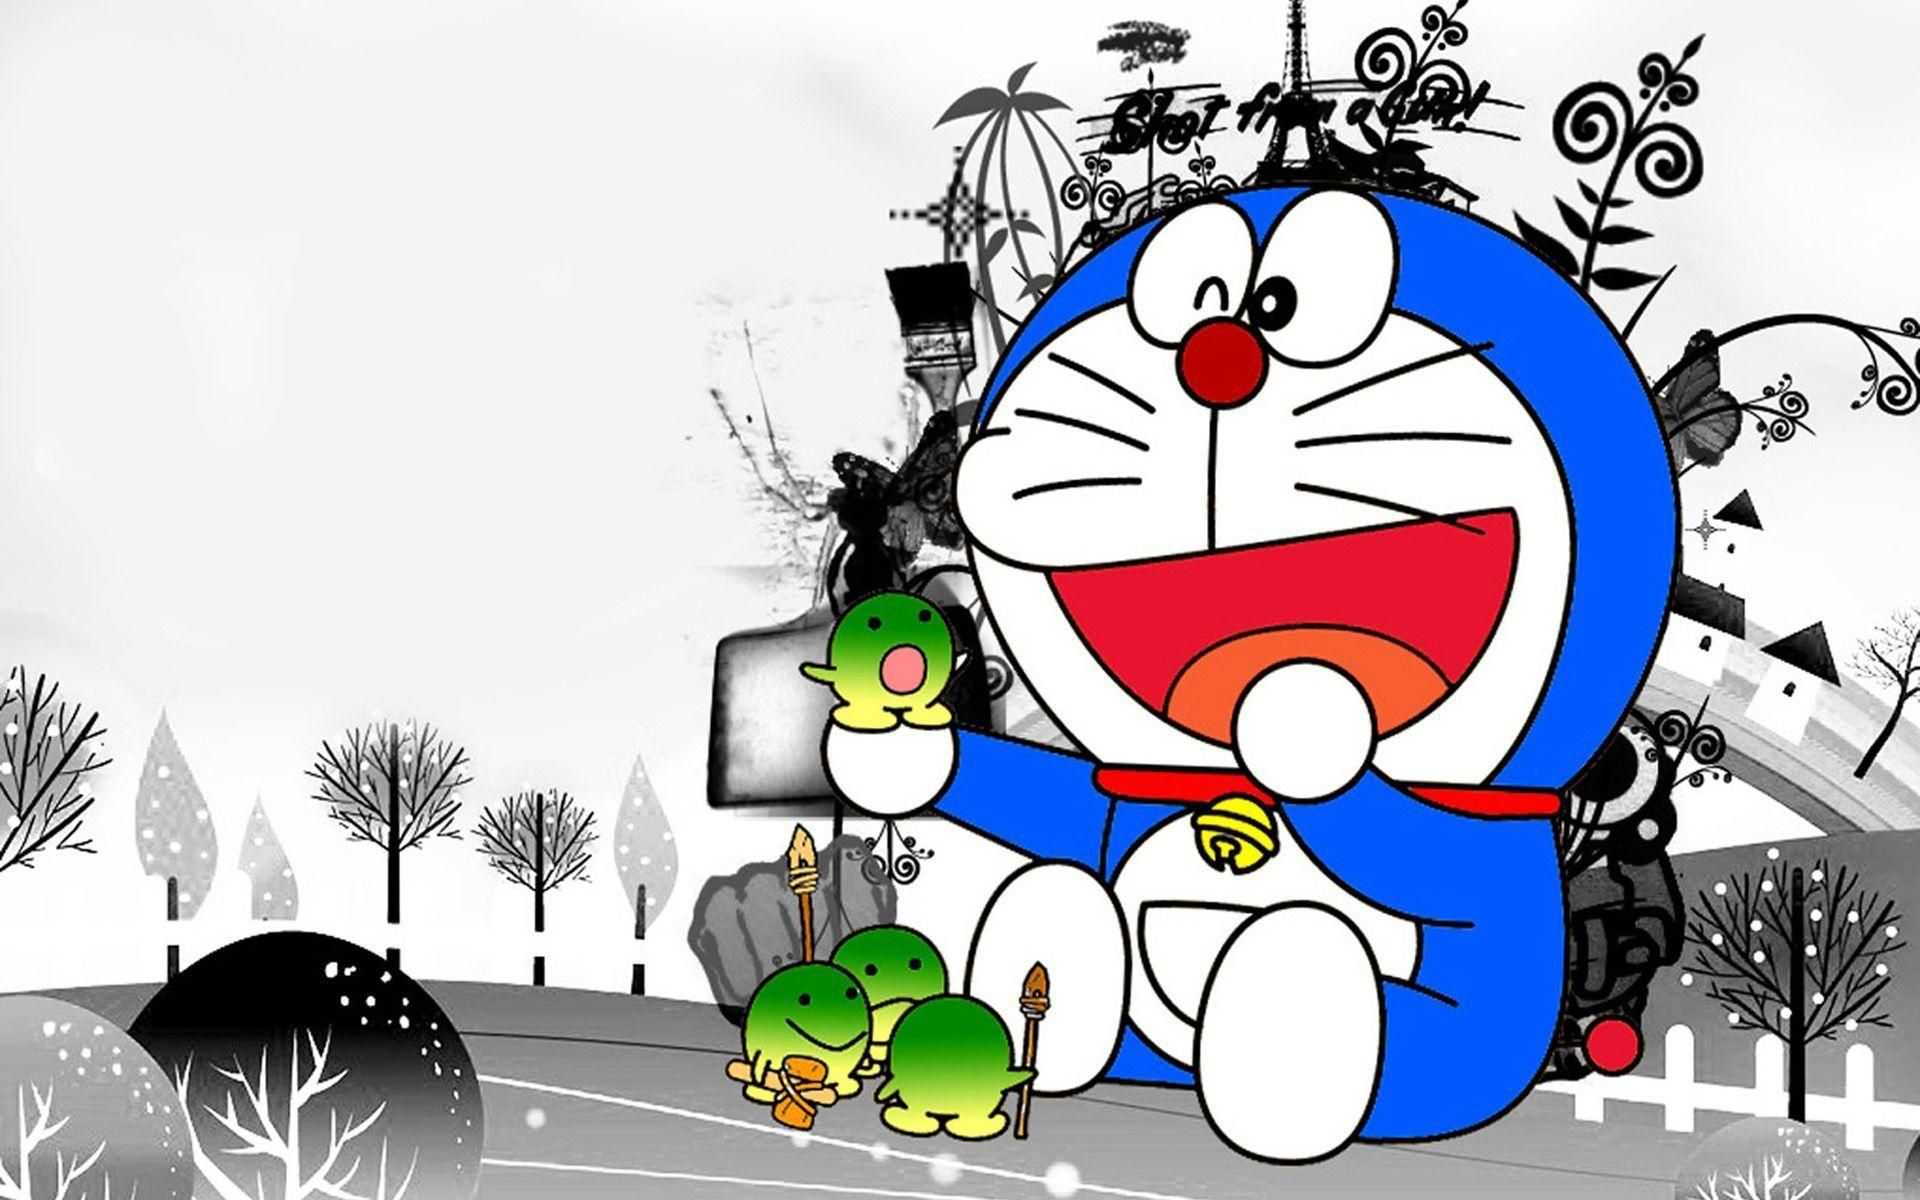 Doraemon Wallpaper HD For Mac Cartoons Images Cartoon